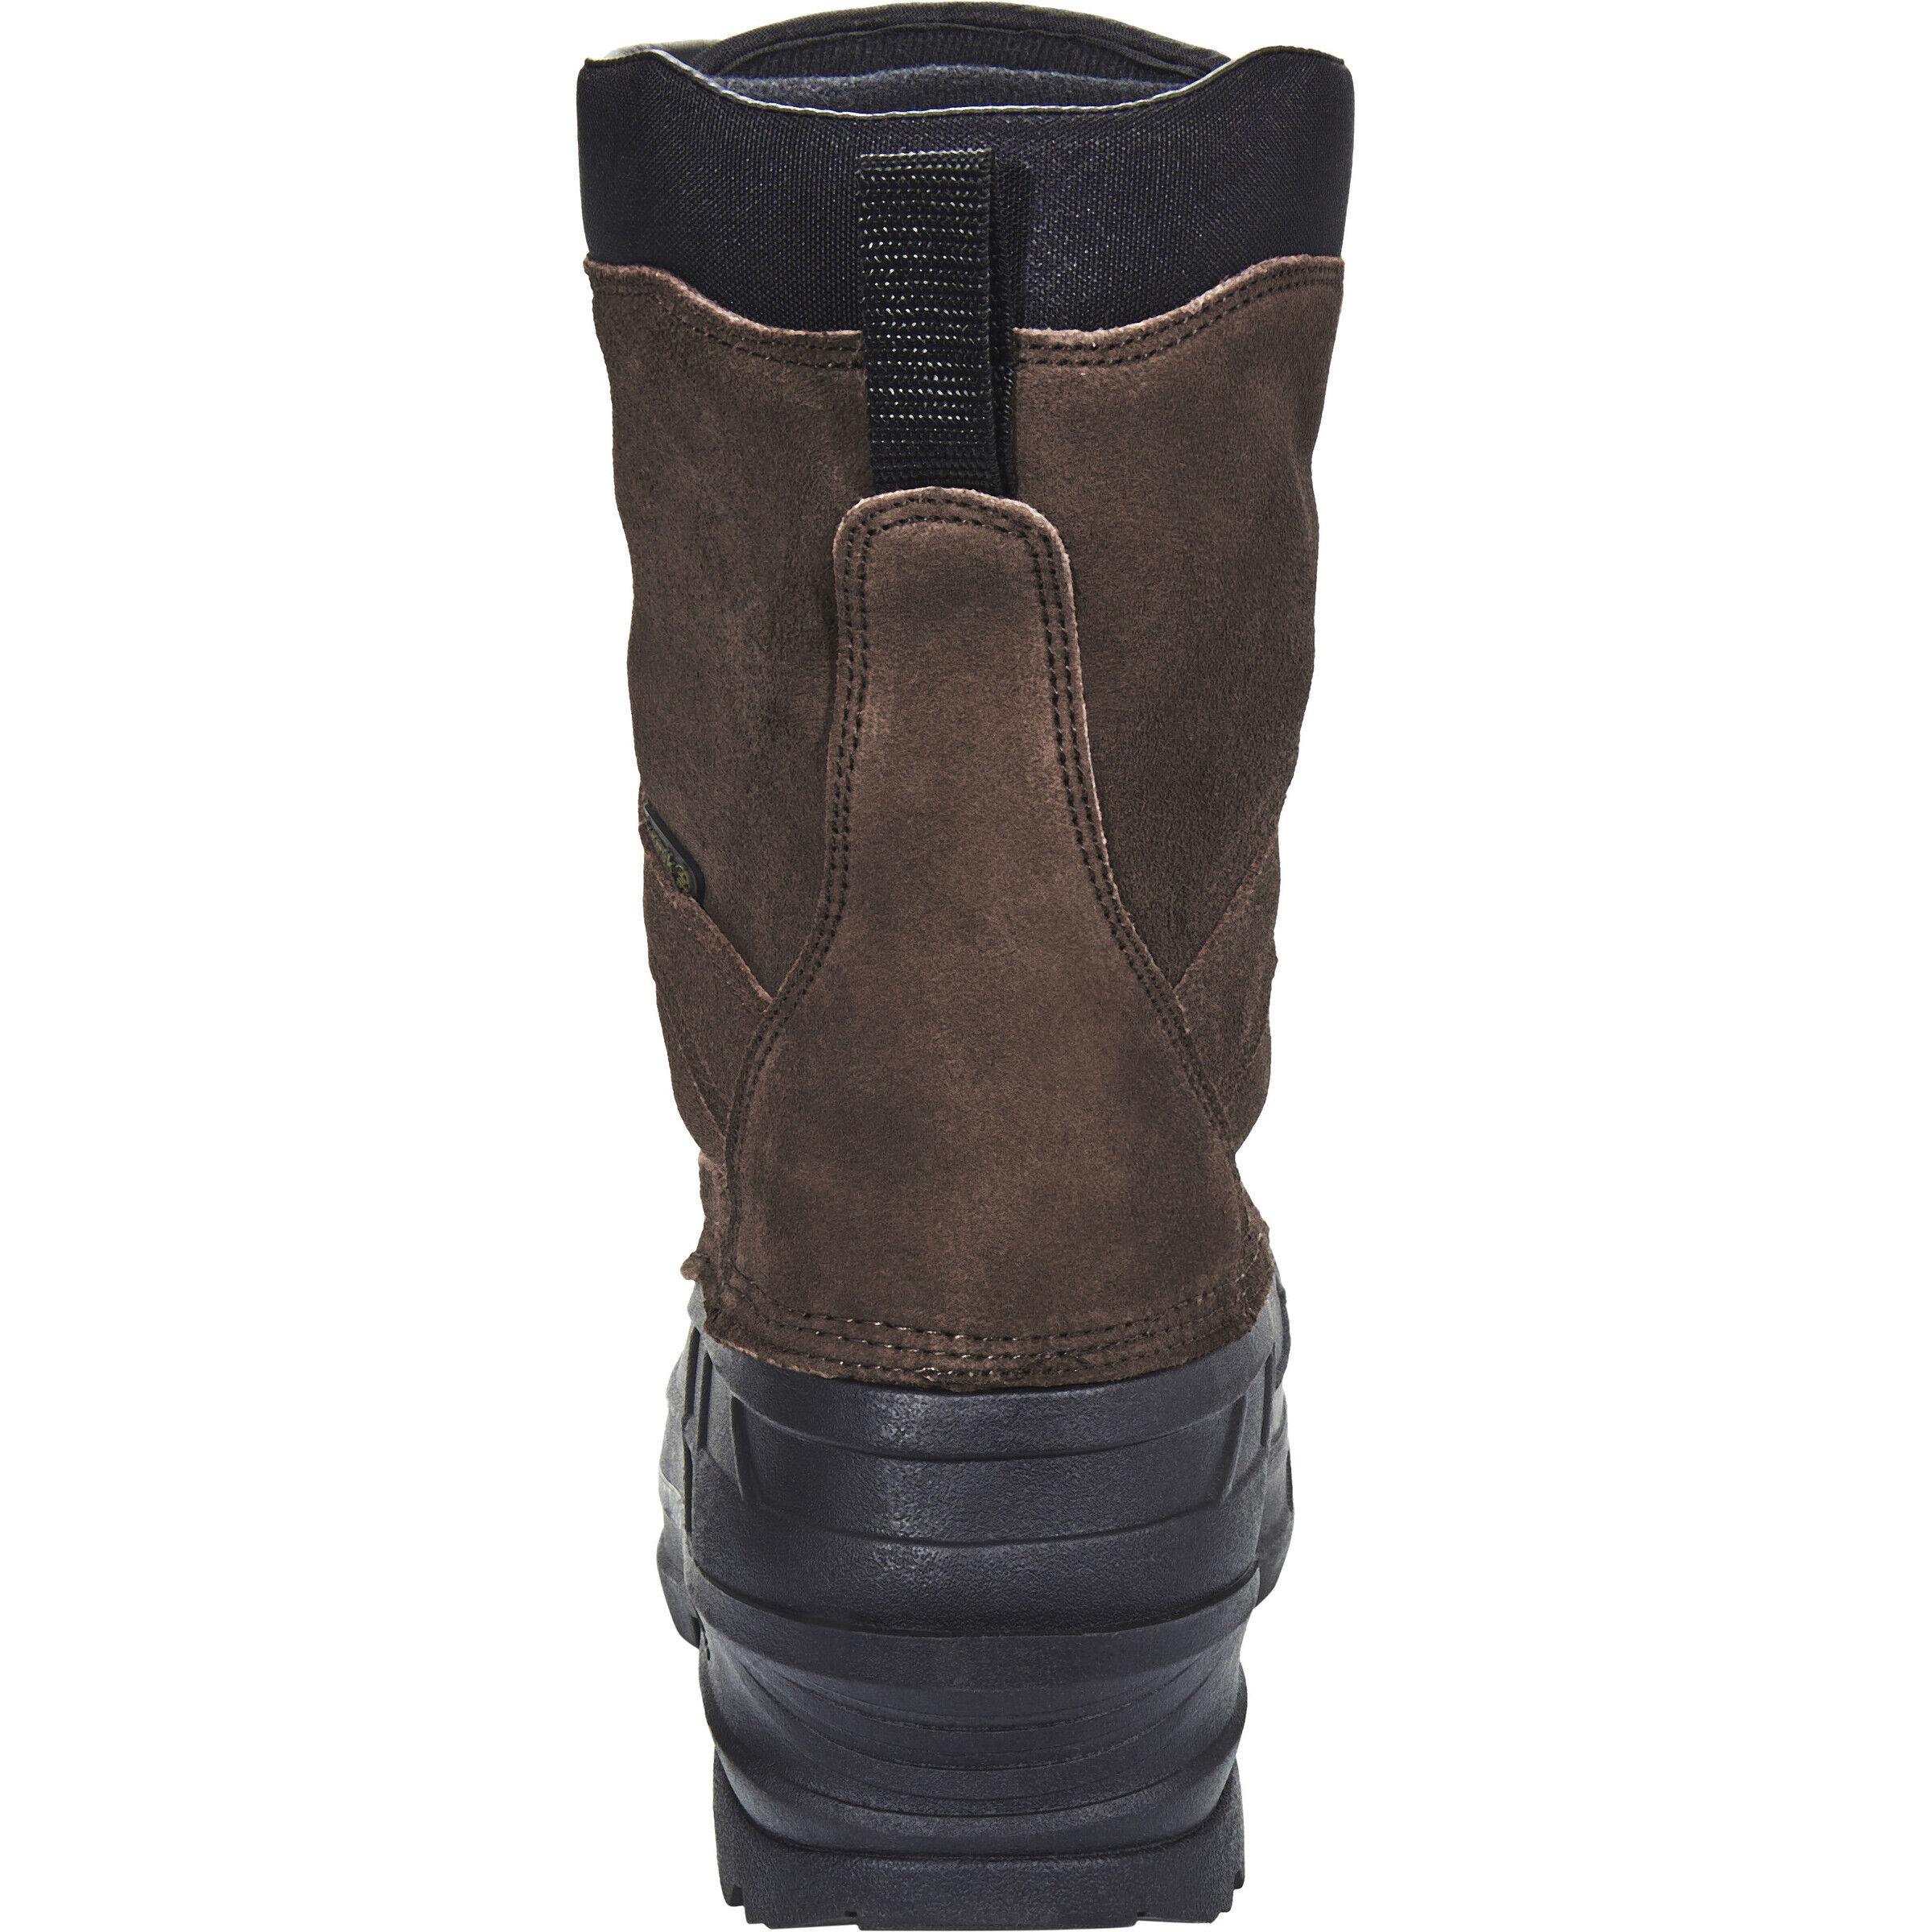 Kamik Nationwide Winter Boots Herren dark brown